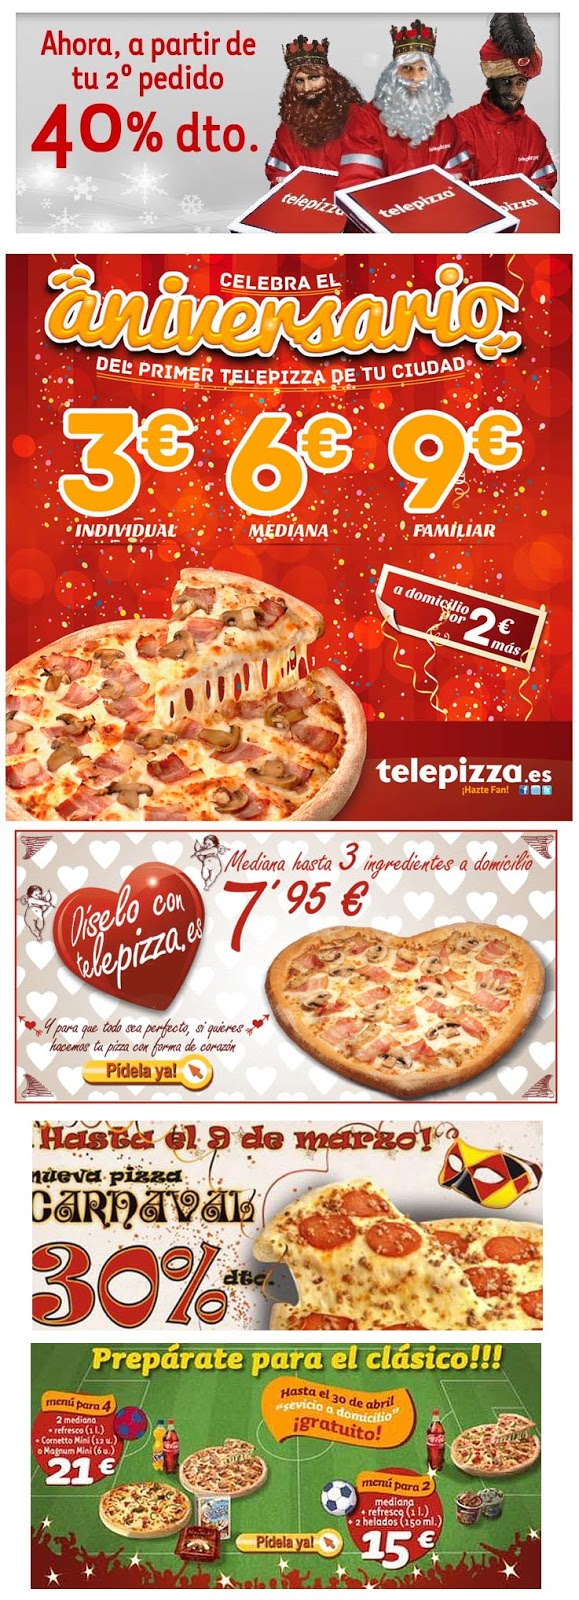 EMPRESAS: Telepizza, la historia de los \